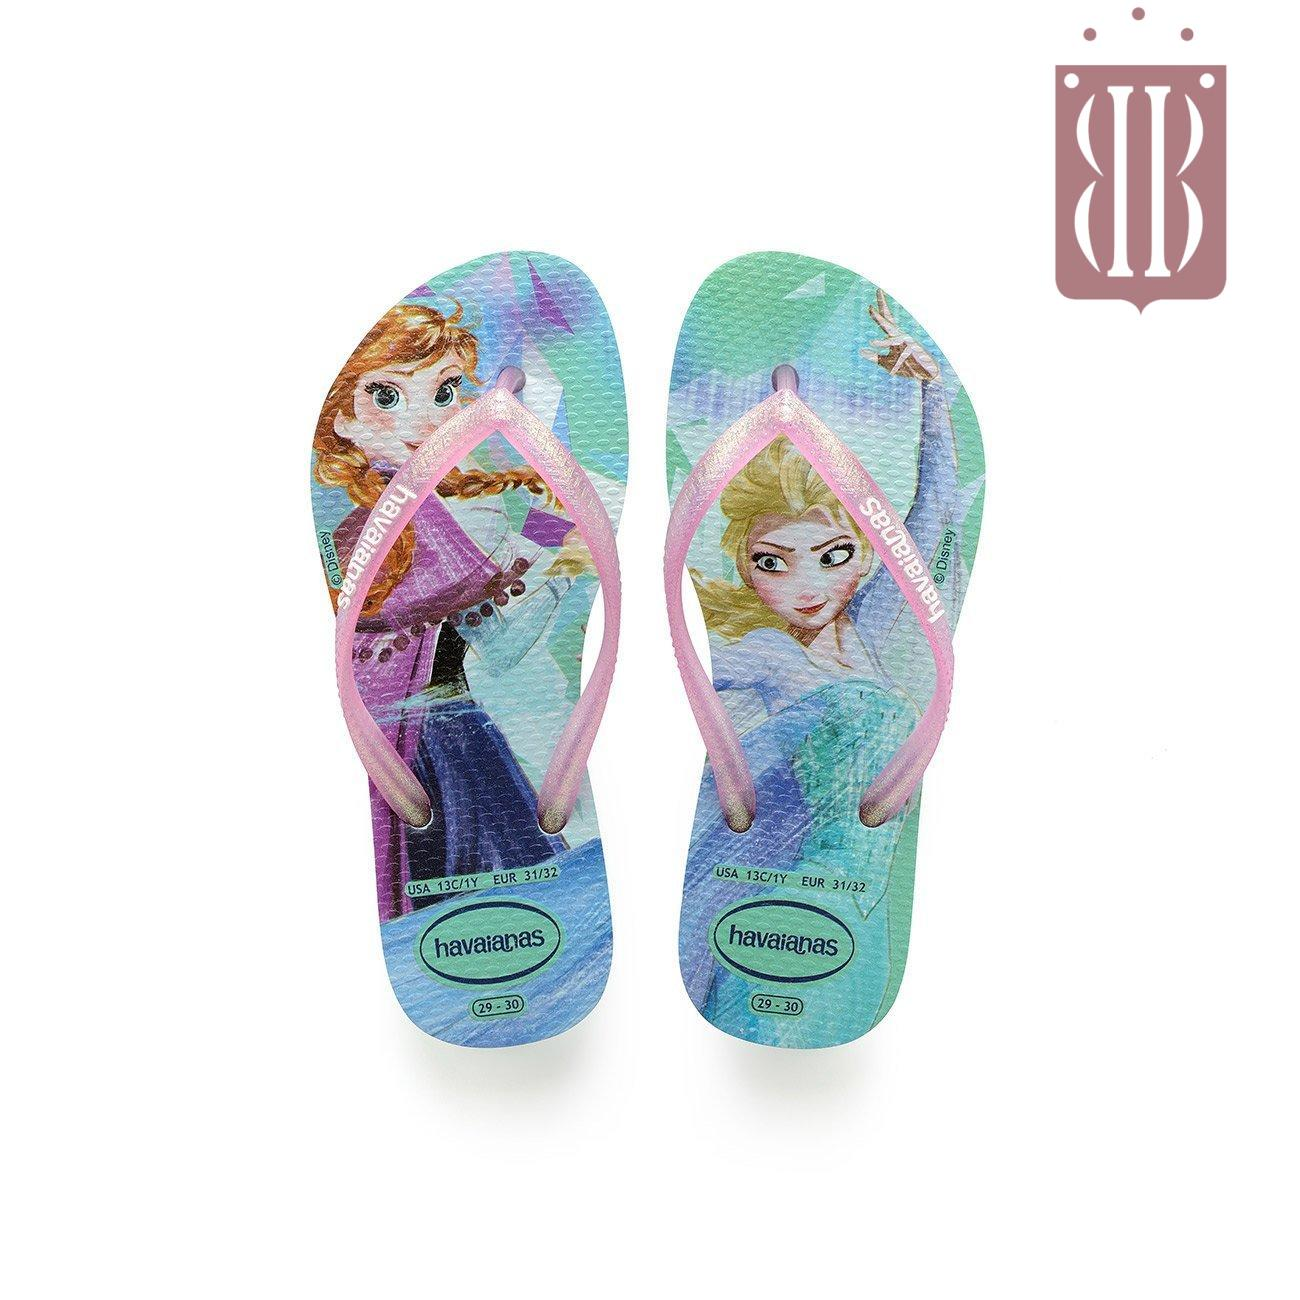 vendita calda reale originale cerca genuino Frozen Store Disney Store Frozen Pantofole Pantofole Disney ...